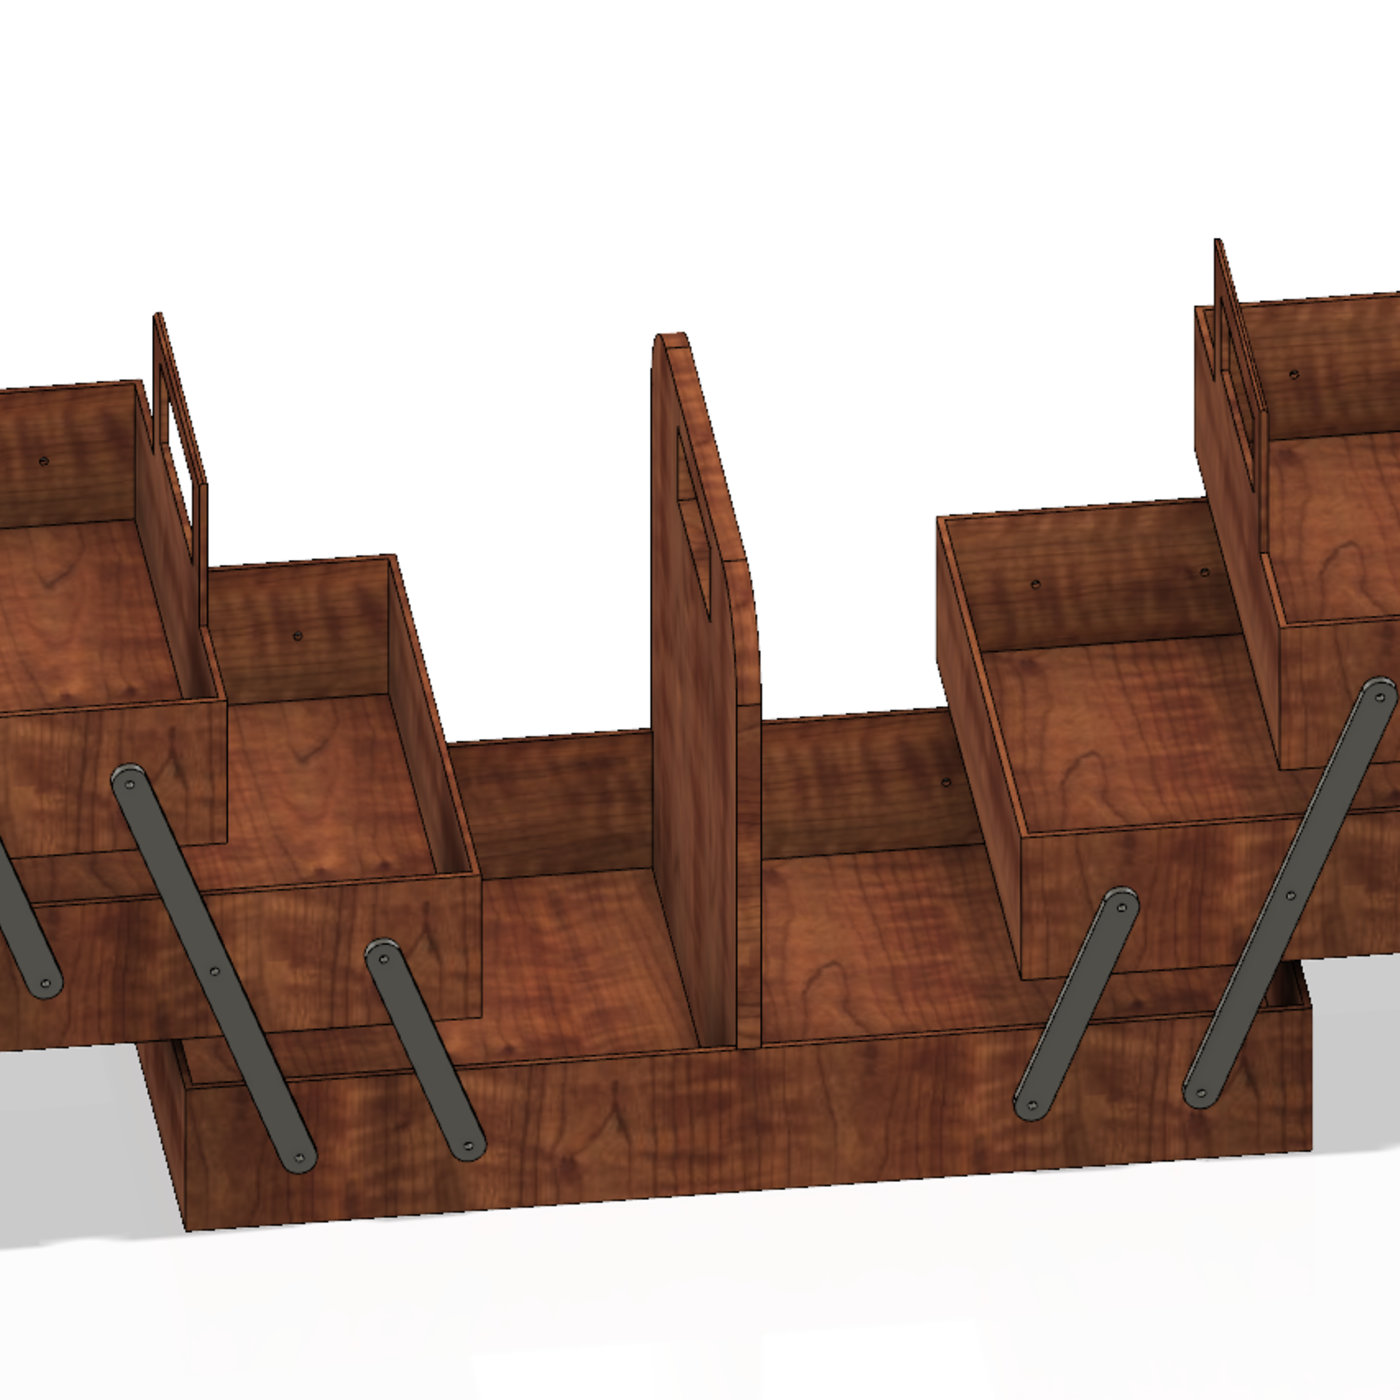 universal tool box – organizer - STL OBJ  AMF model for 3D-print and cnc